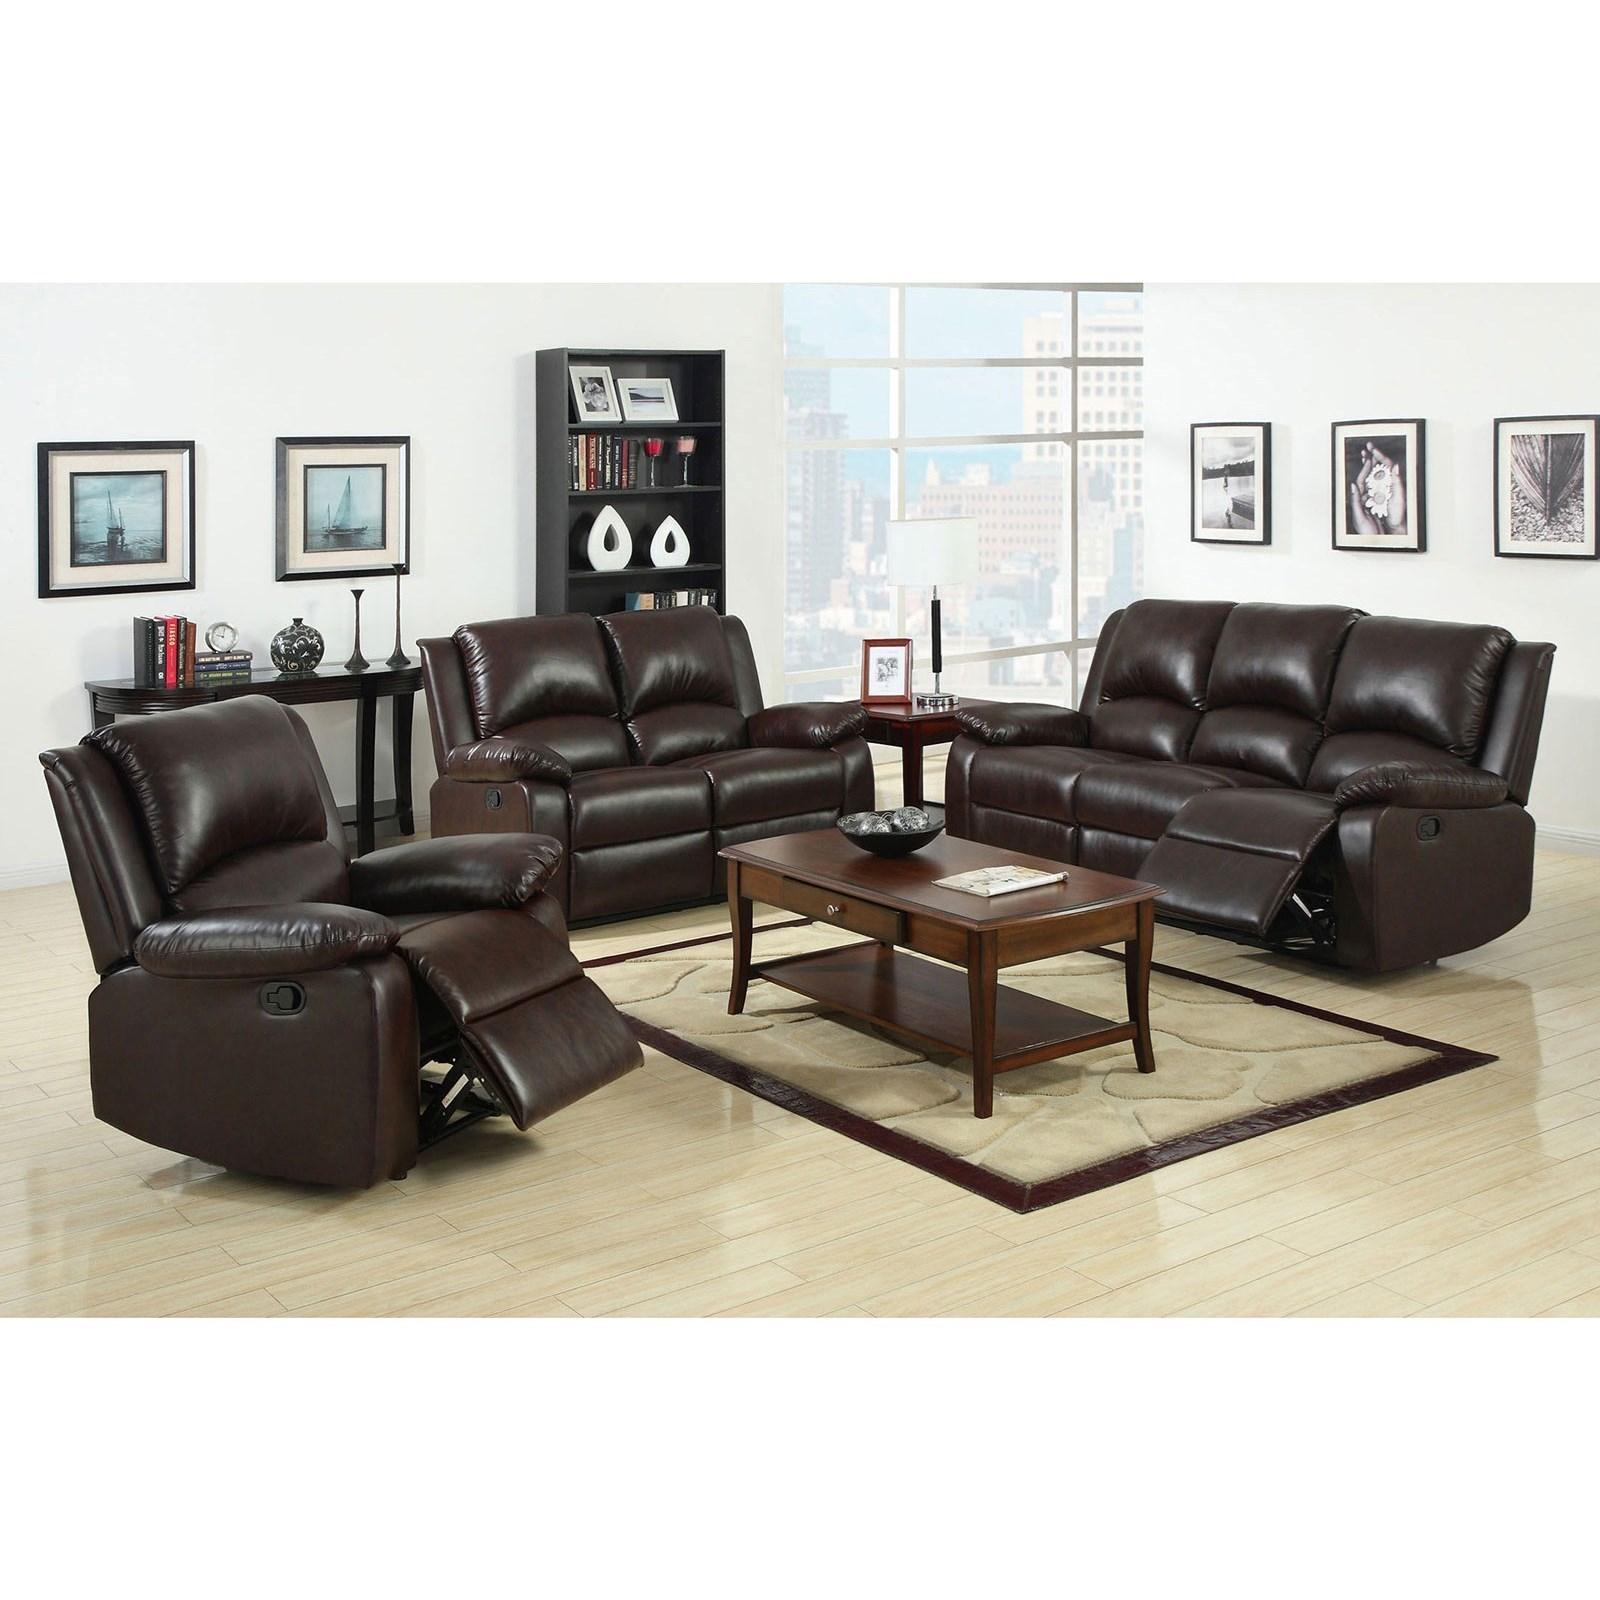 Furniture of America Oxford Three Piece Reclining Living Room Set ...